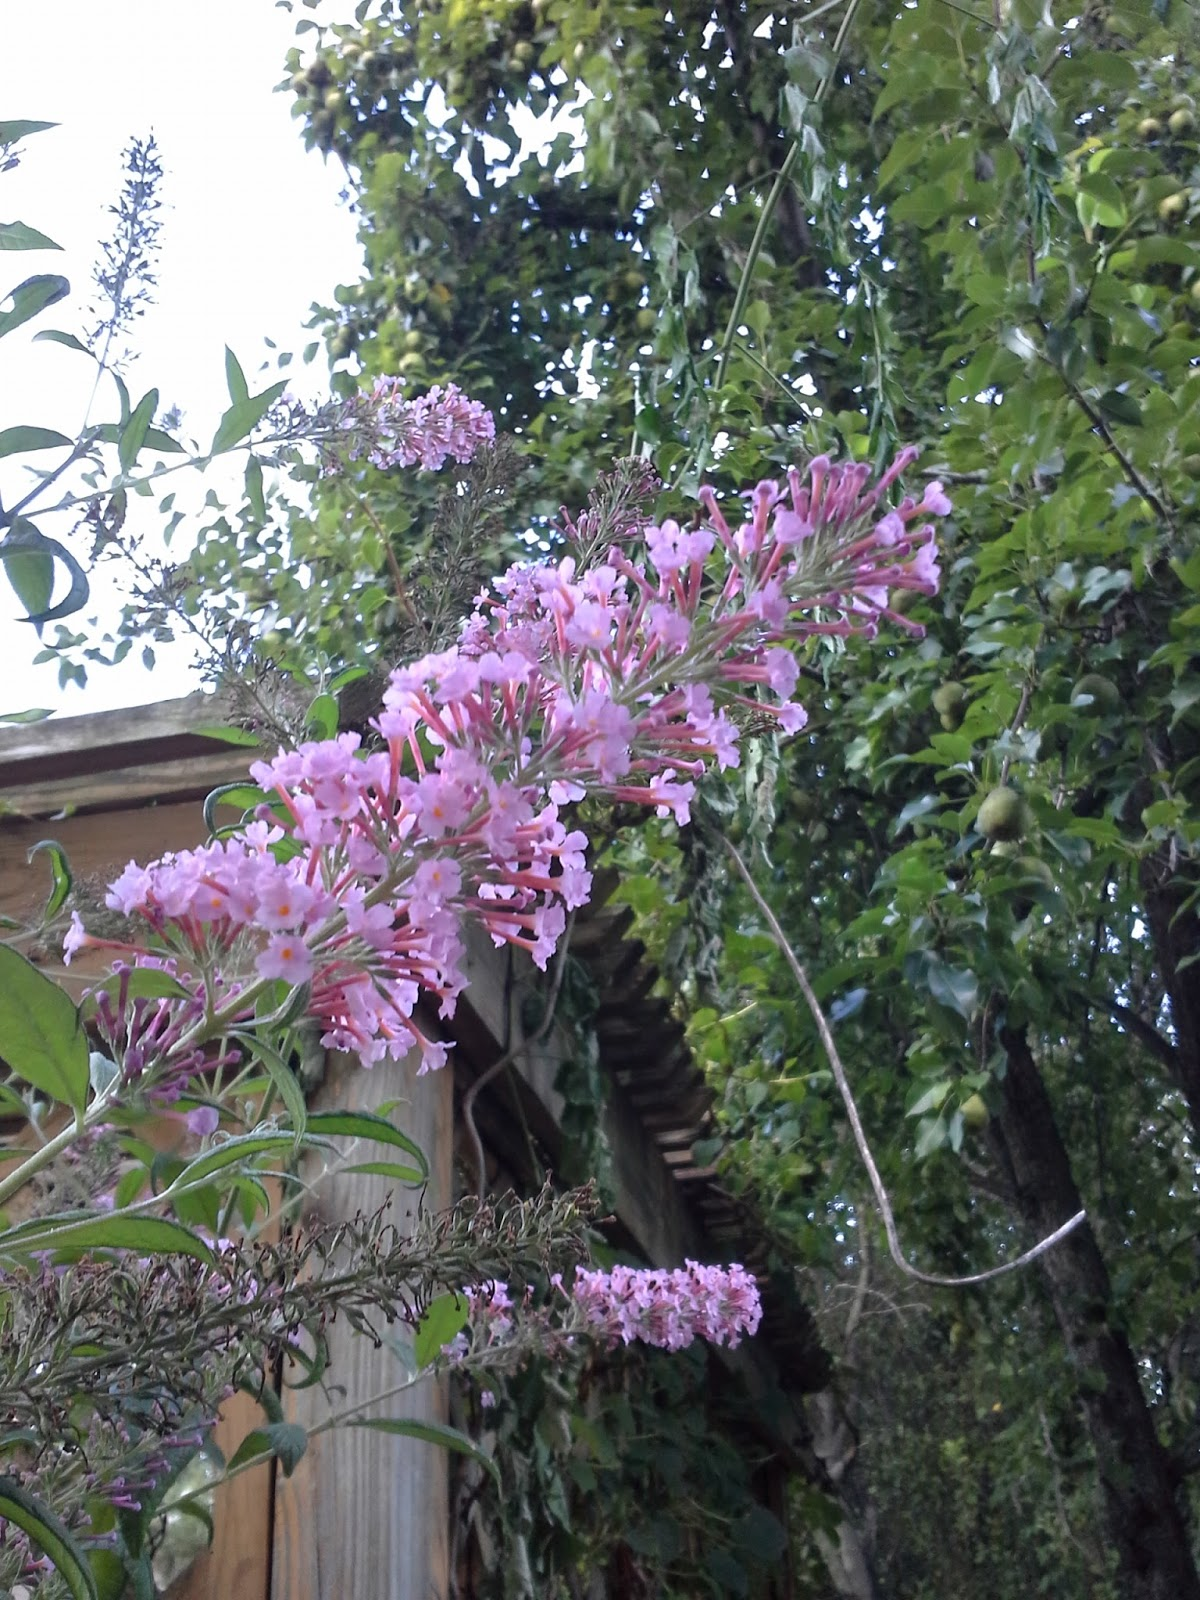 Linda Lu S Comments Butterfly Bush Buddleia For The Backyard Garden